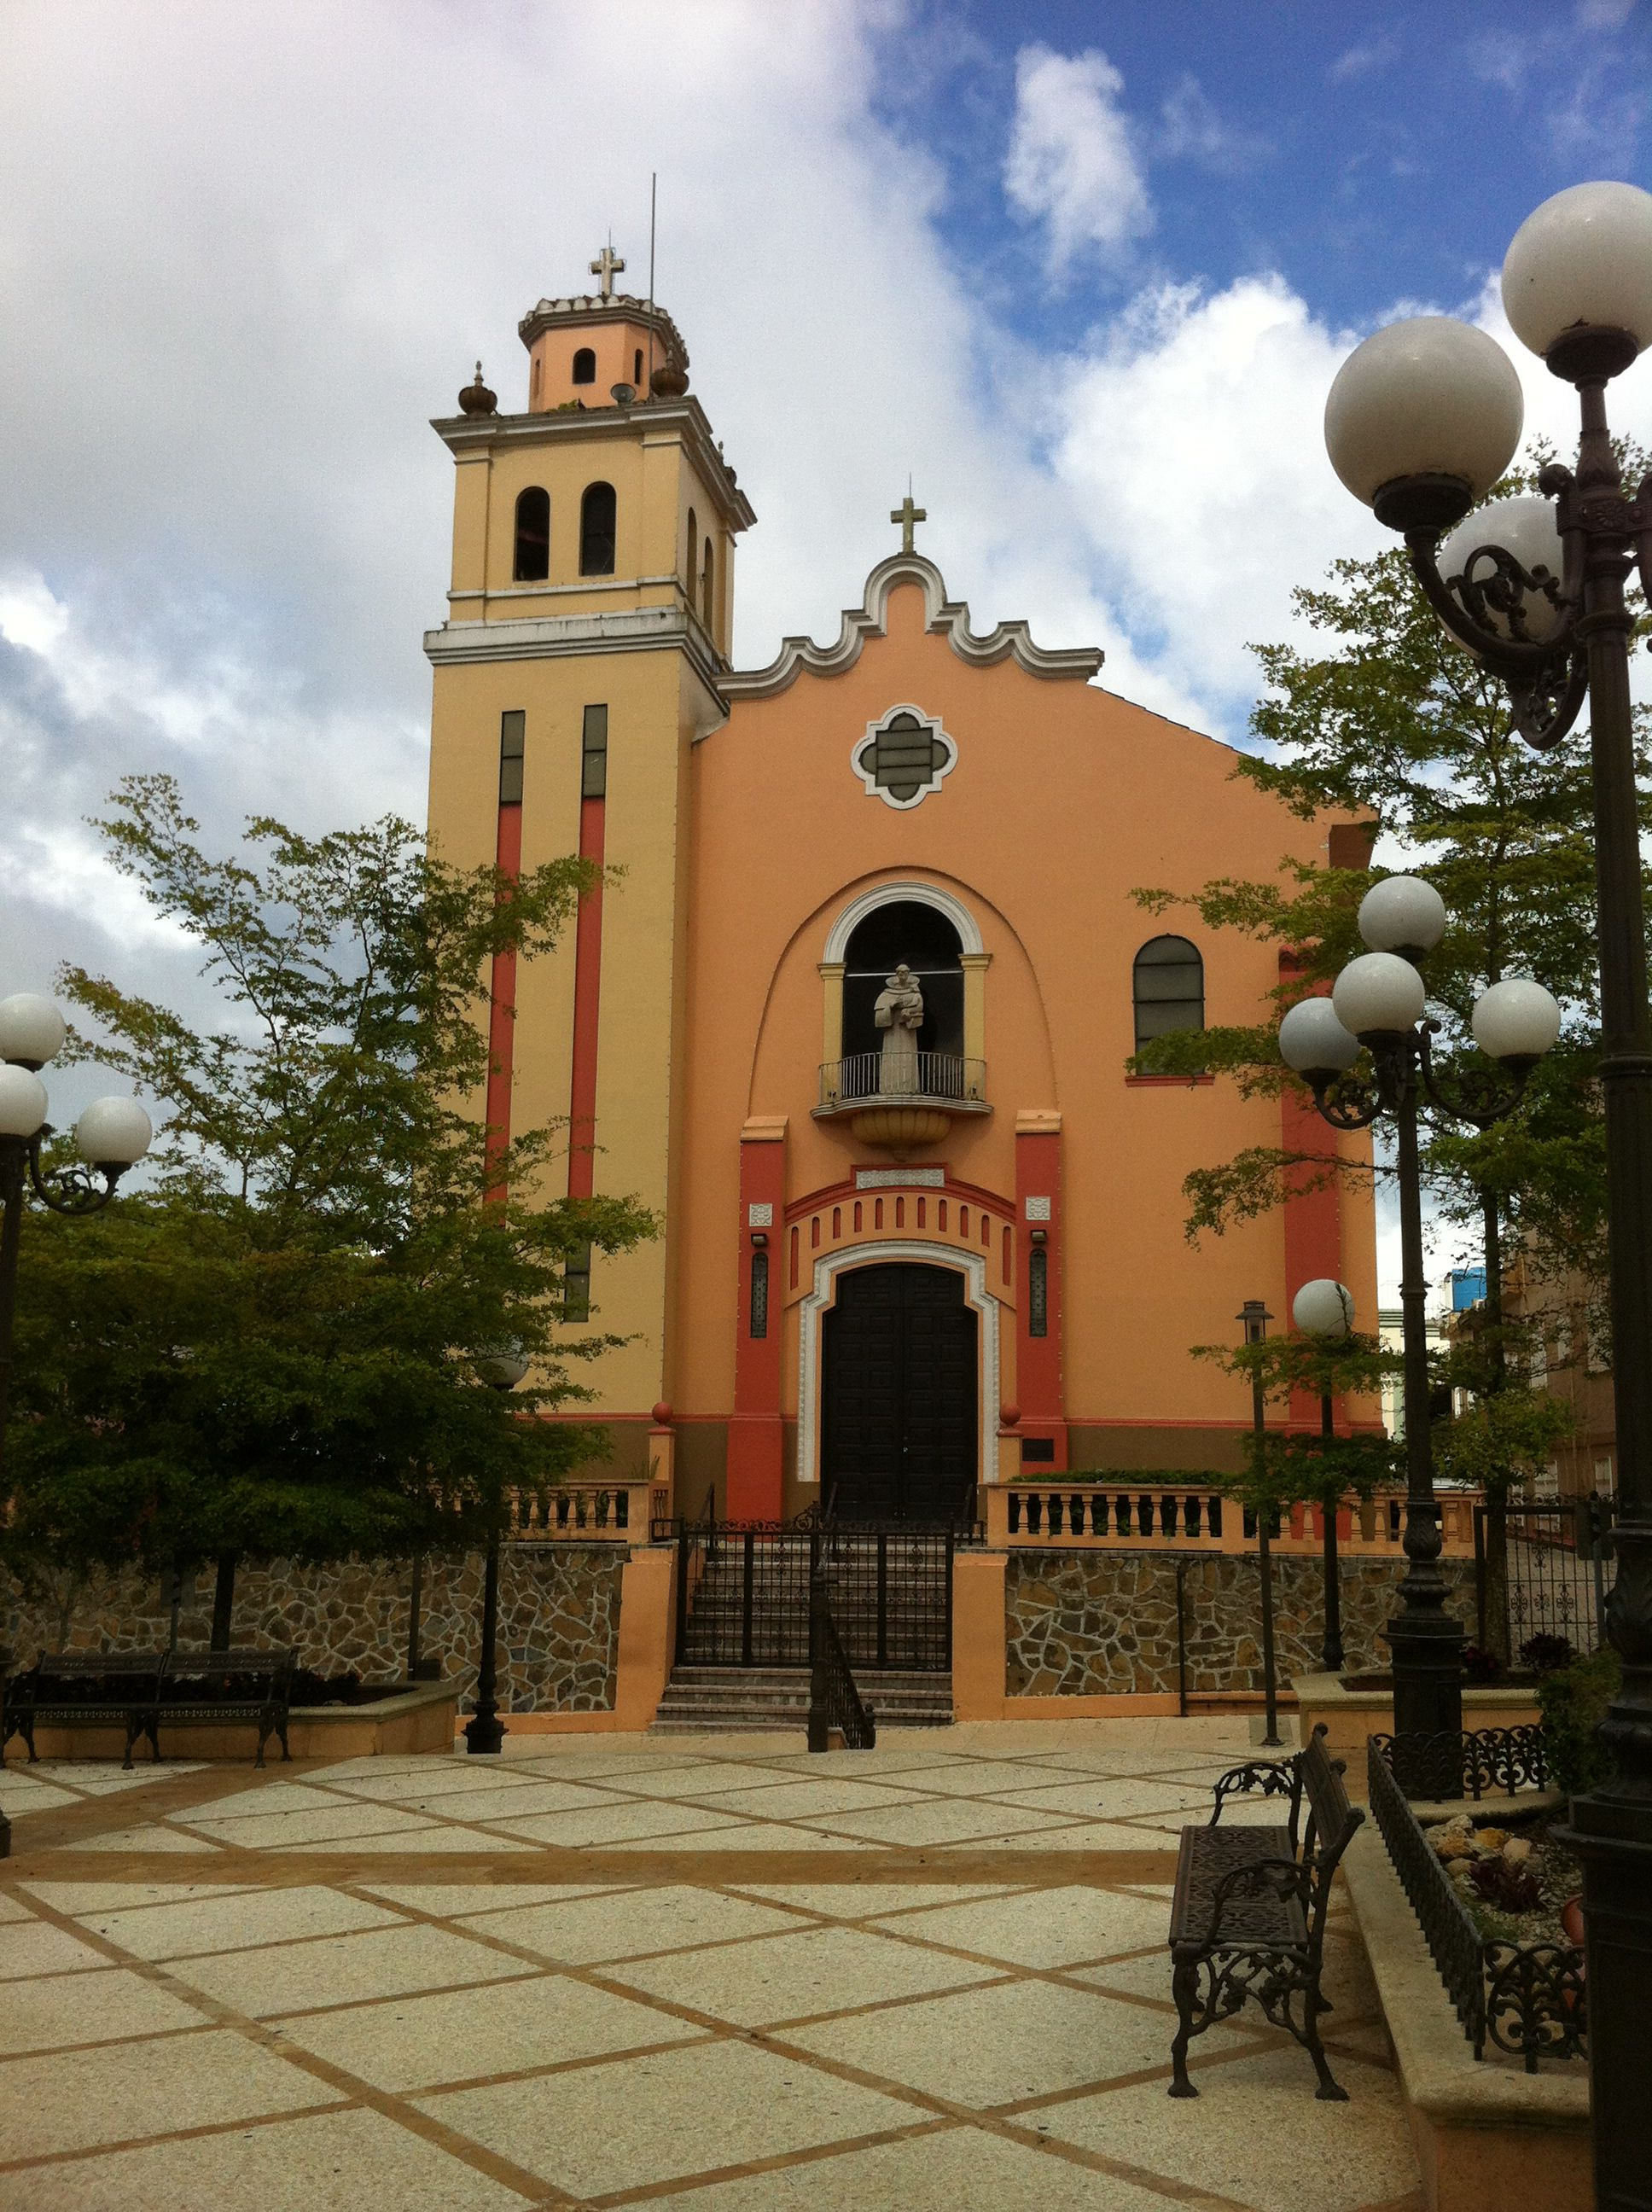 Iglesia San Antonio de Padua, Barranquitas